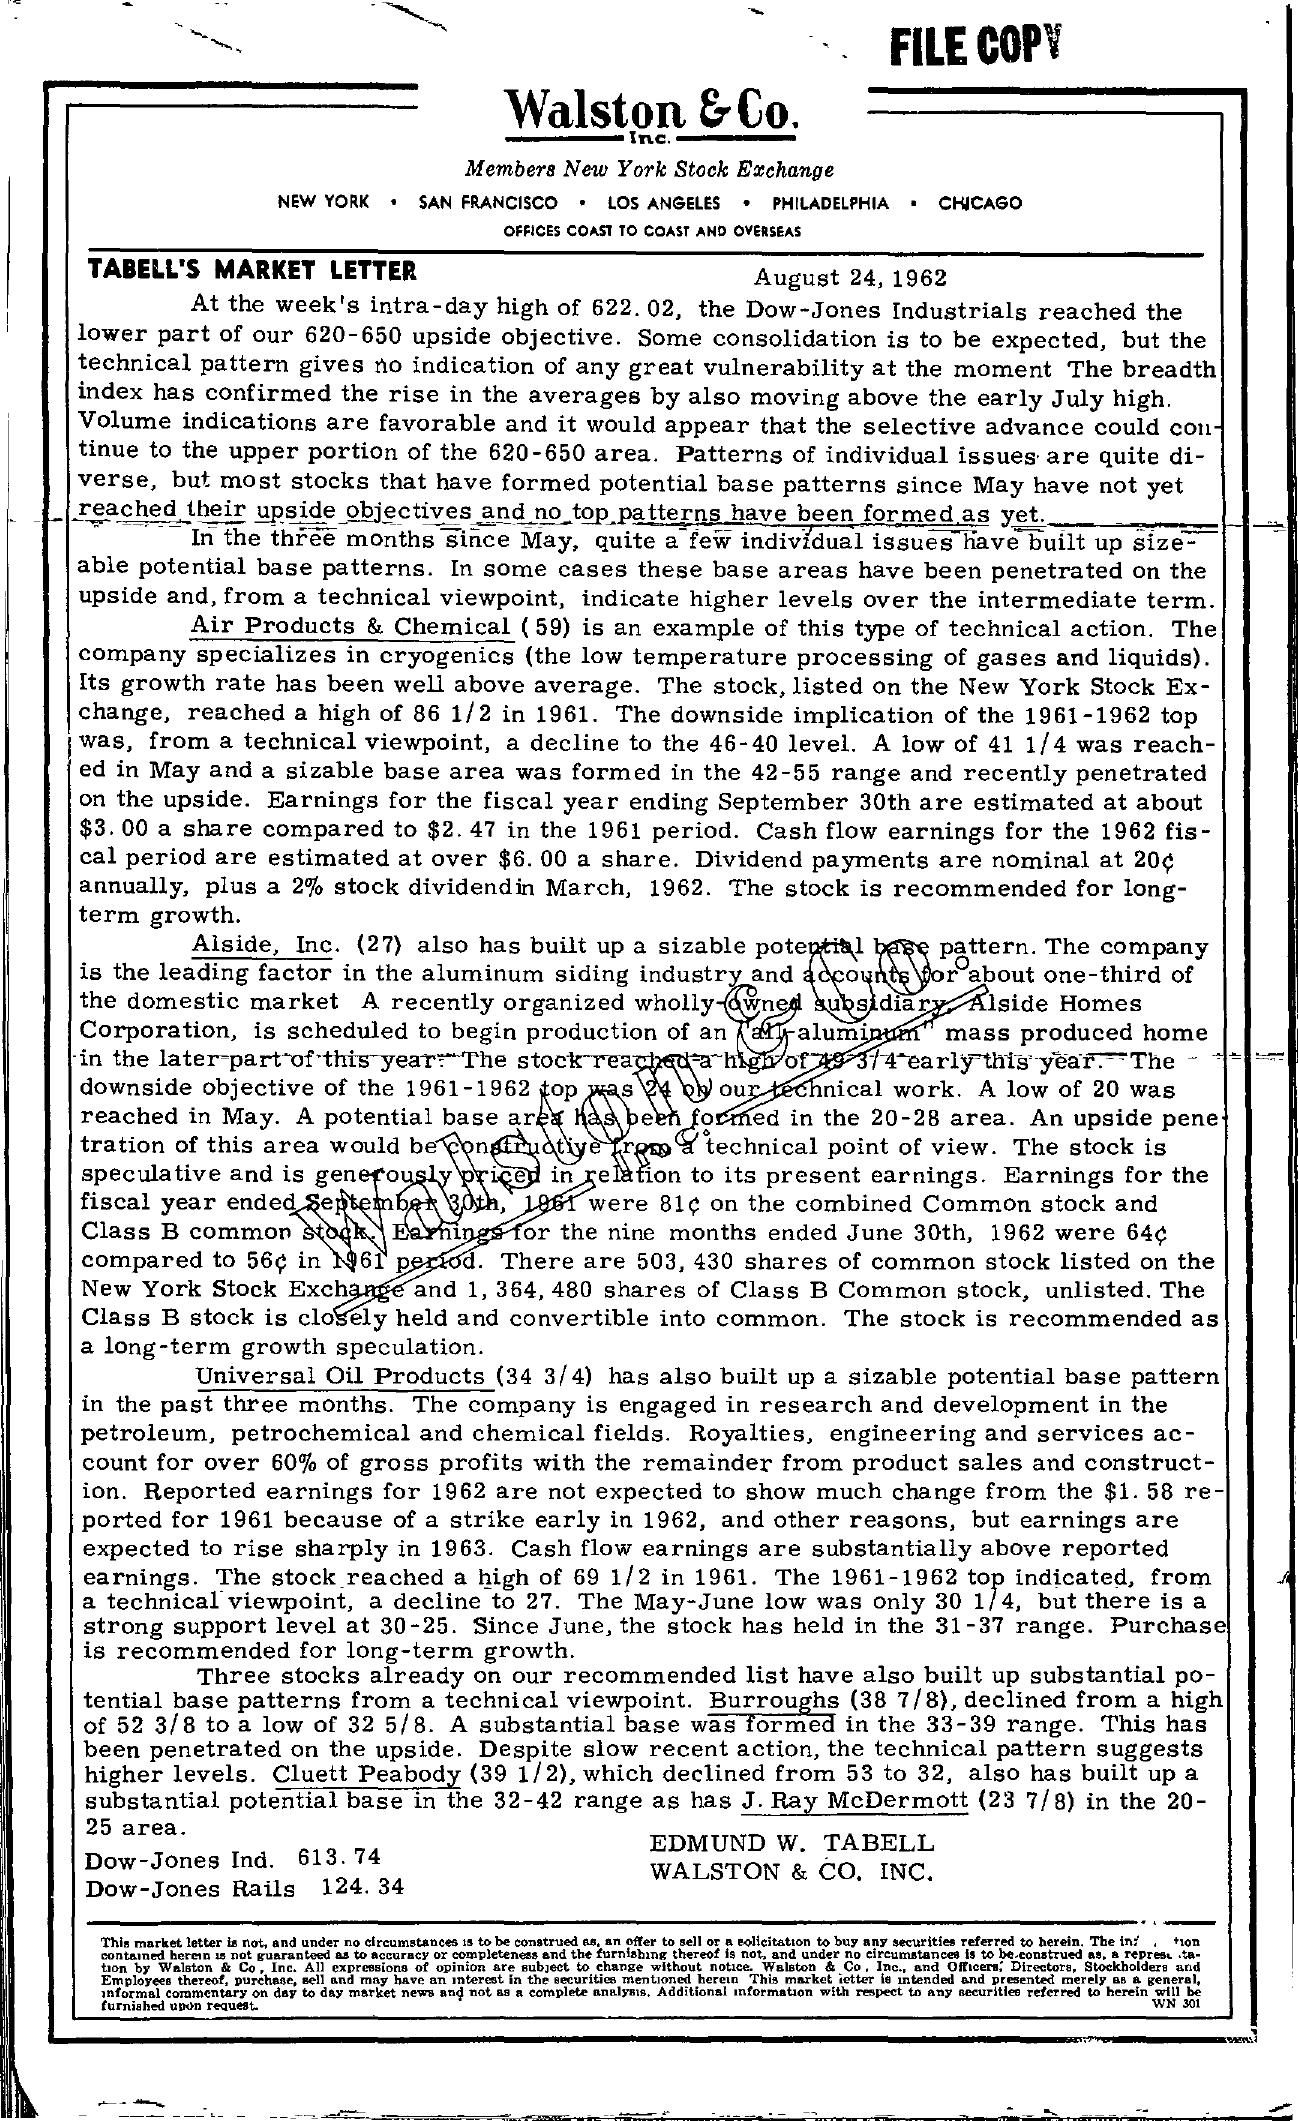 Tabell's Market Letter - August 24, 1962